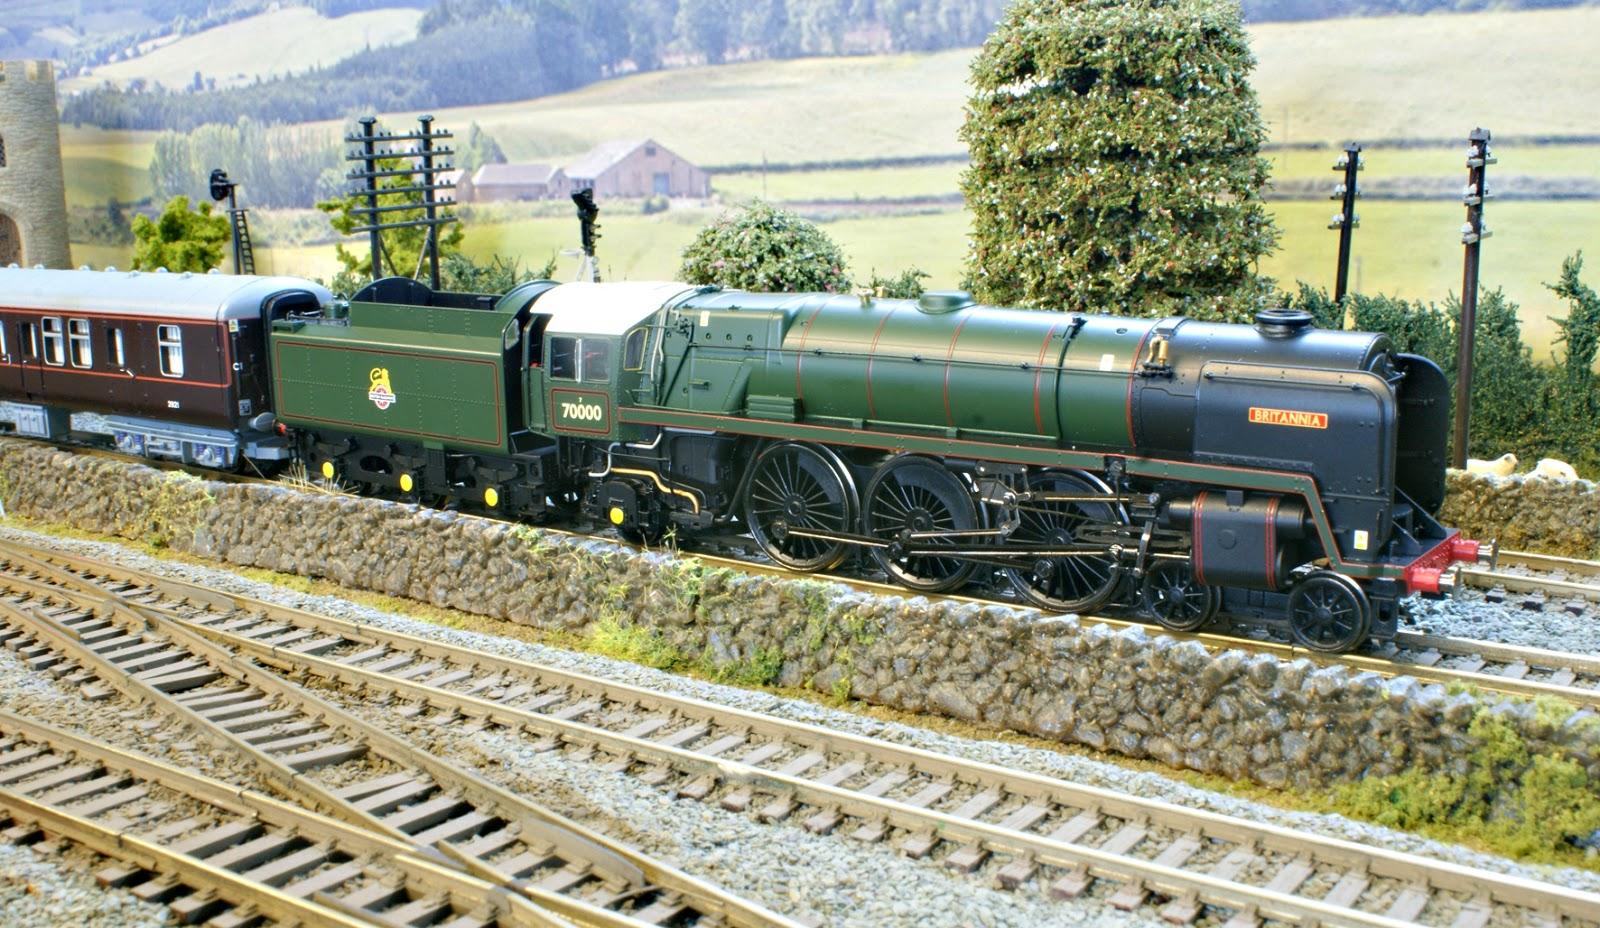 Lakeland Railway: Royal Britannia